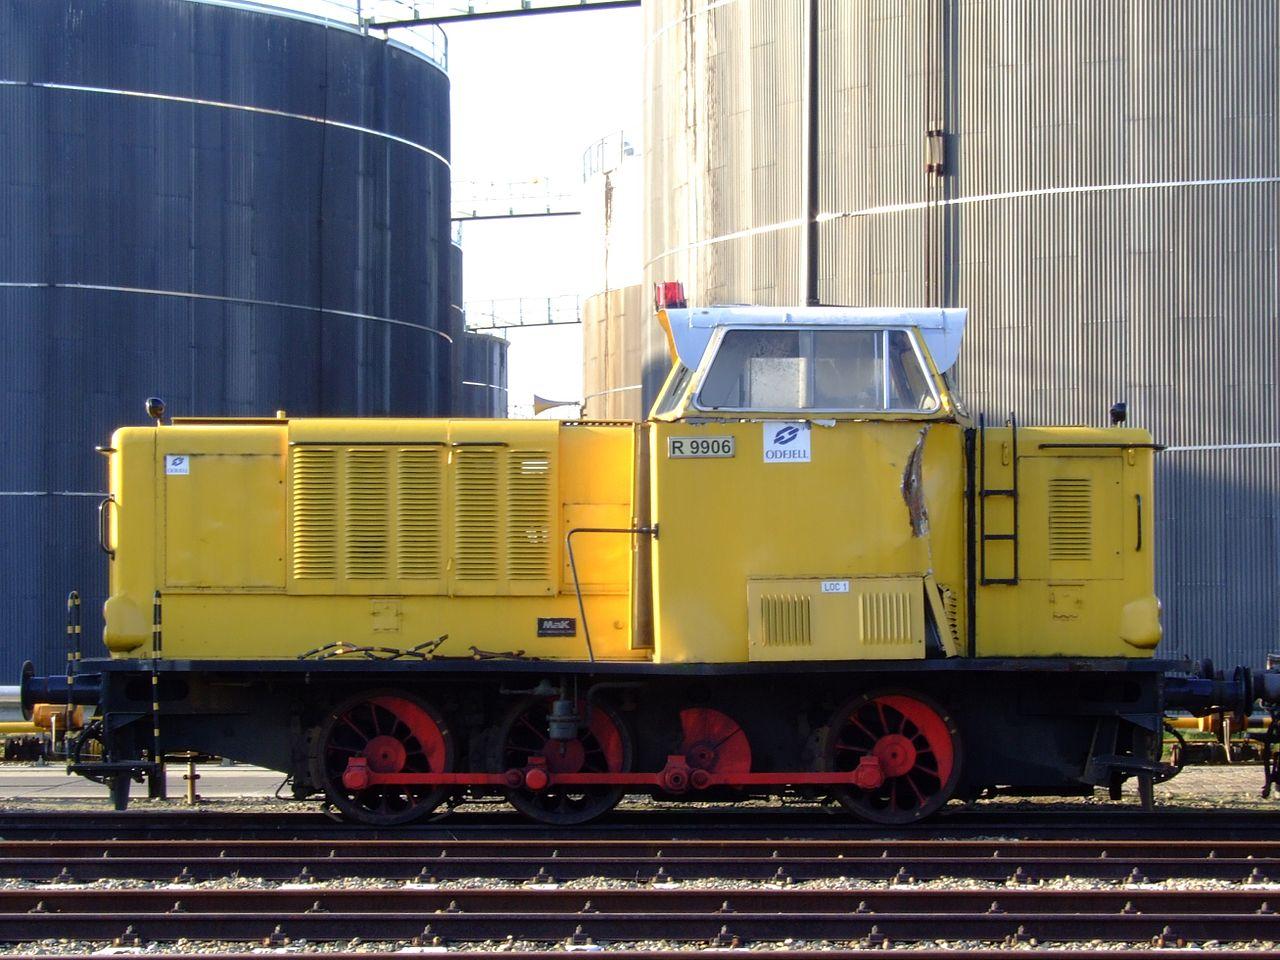 file diesel locomotive r9905 loc 1 at odfjell terminal europoort rotterdam holland pic2 jpg. Black Bedroom Furniture Sets. Home Design Ideas